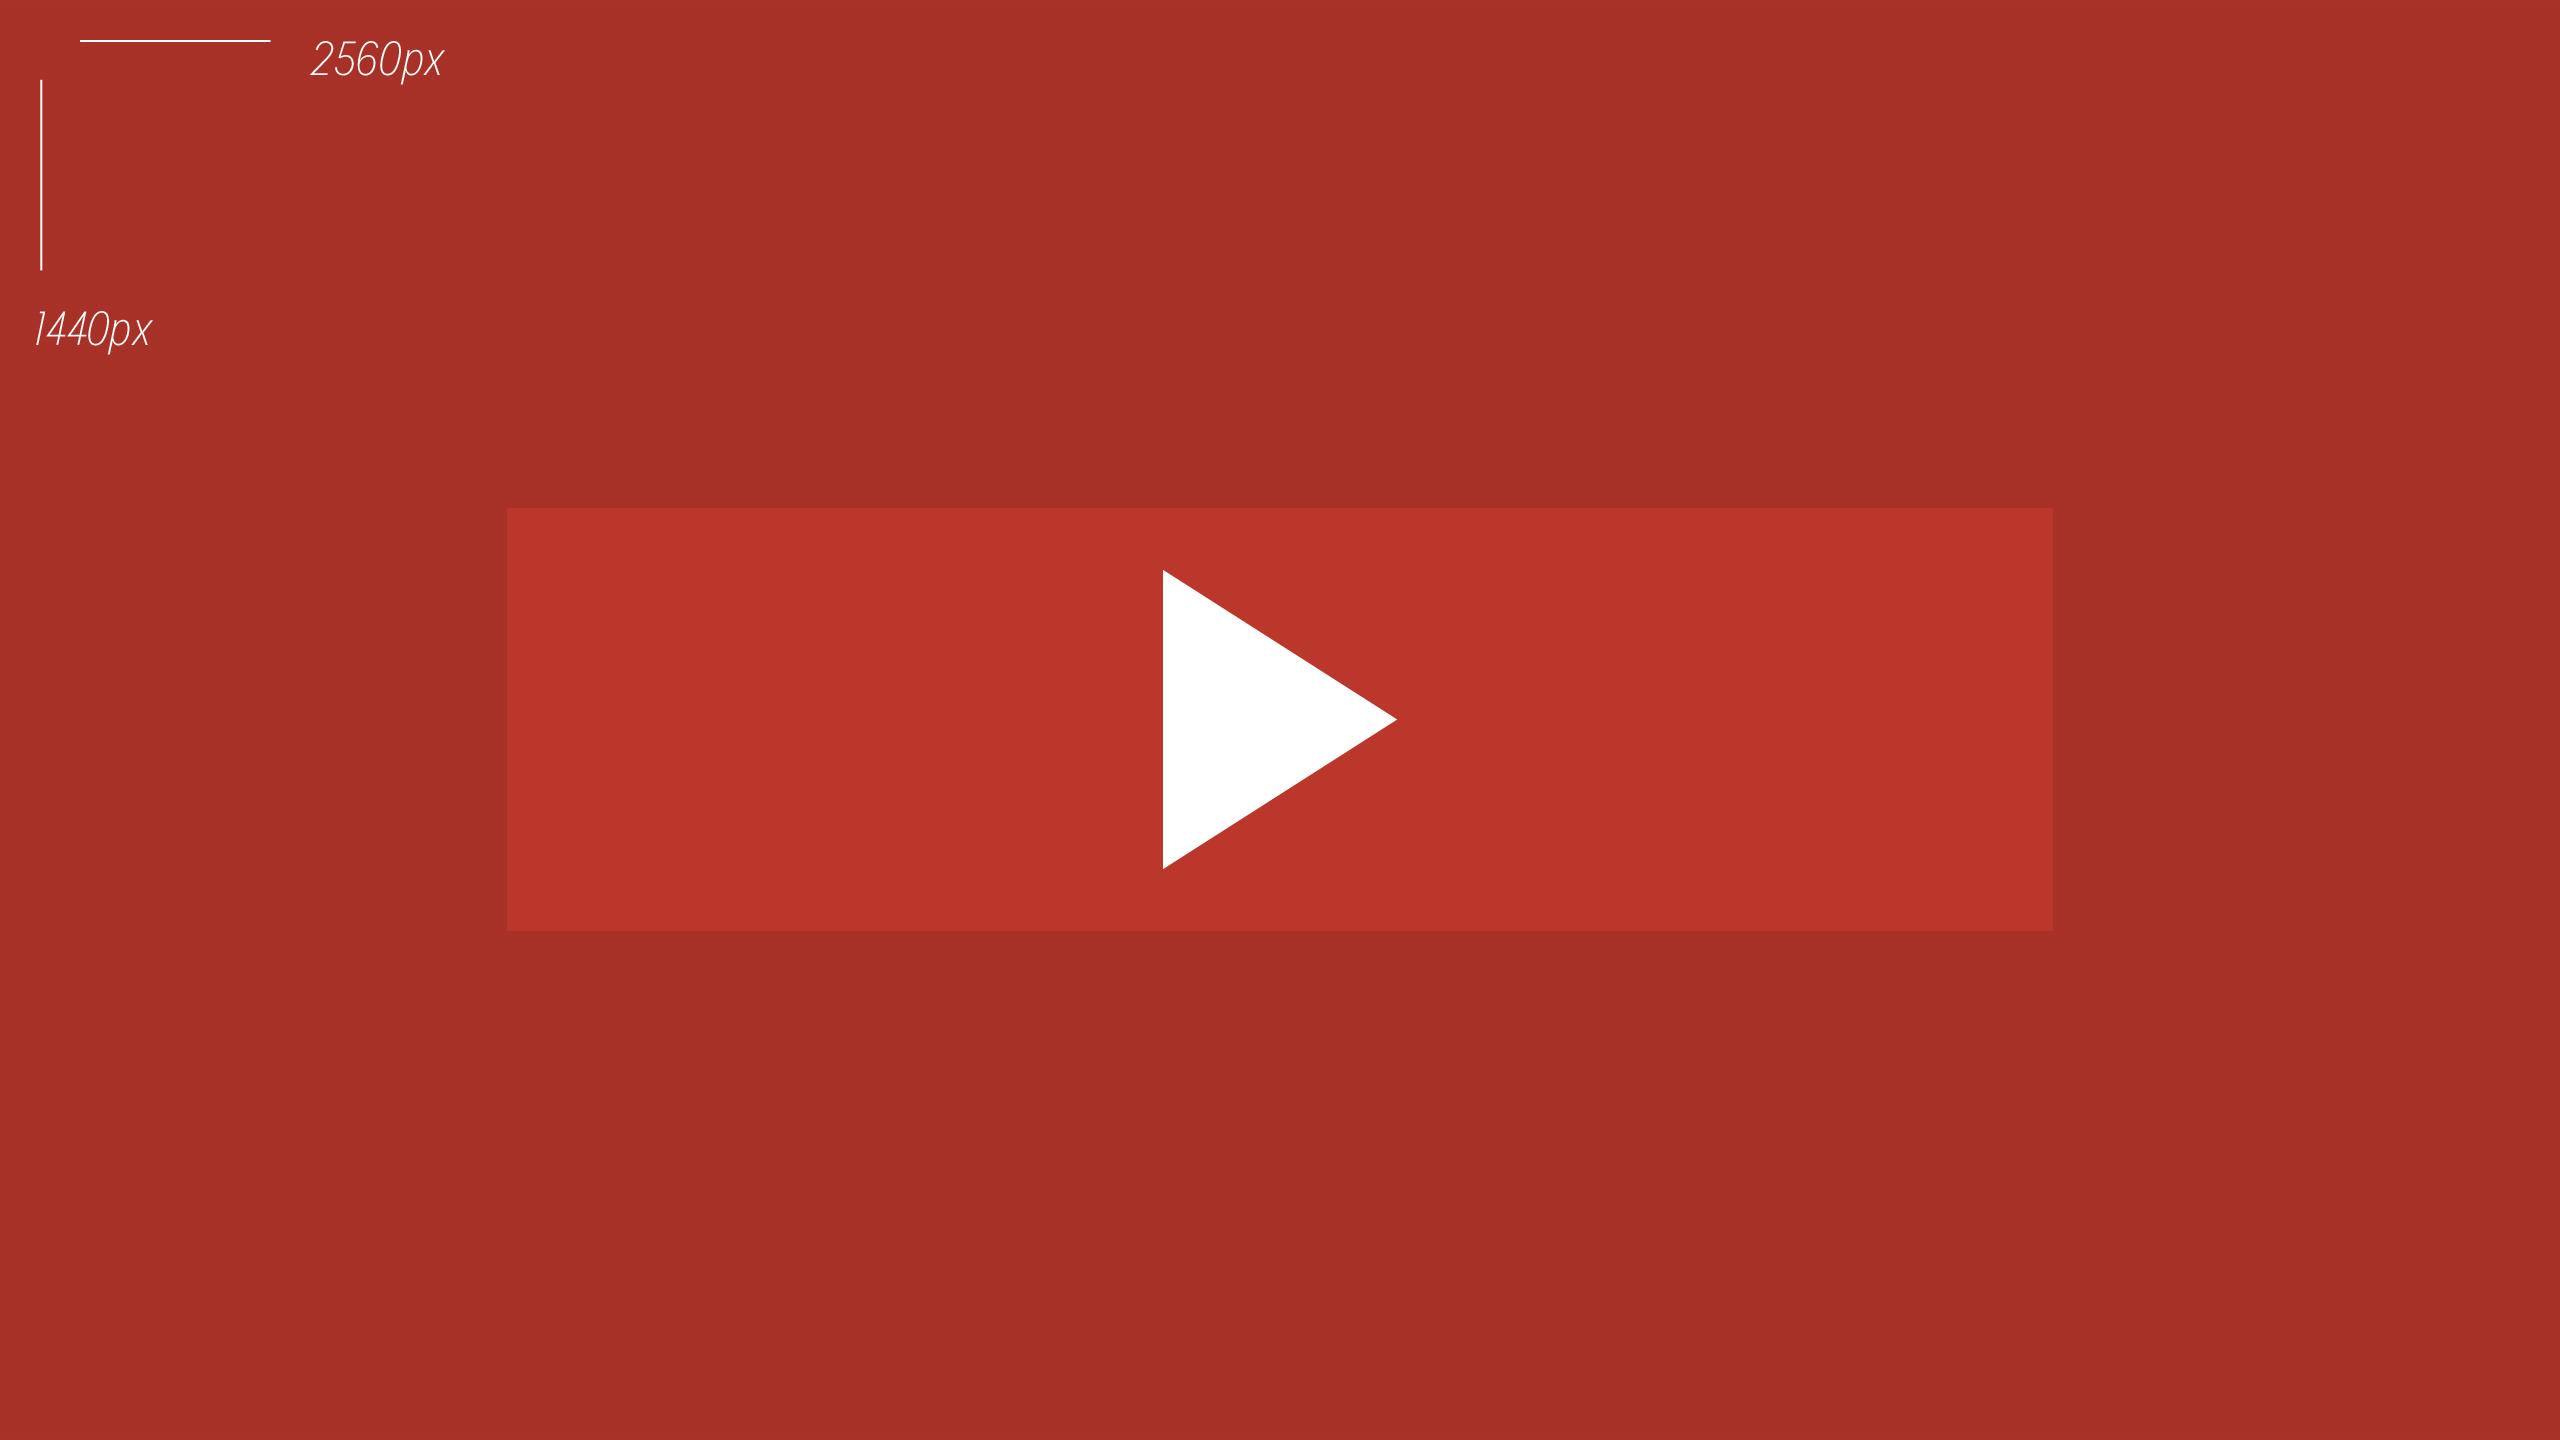 47+] 2560x1440 Wallpaper for YouTube on WallpaperSafari